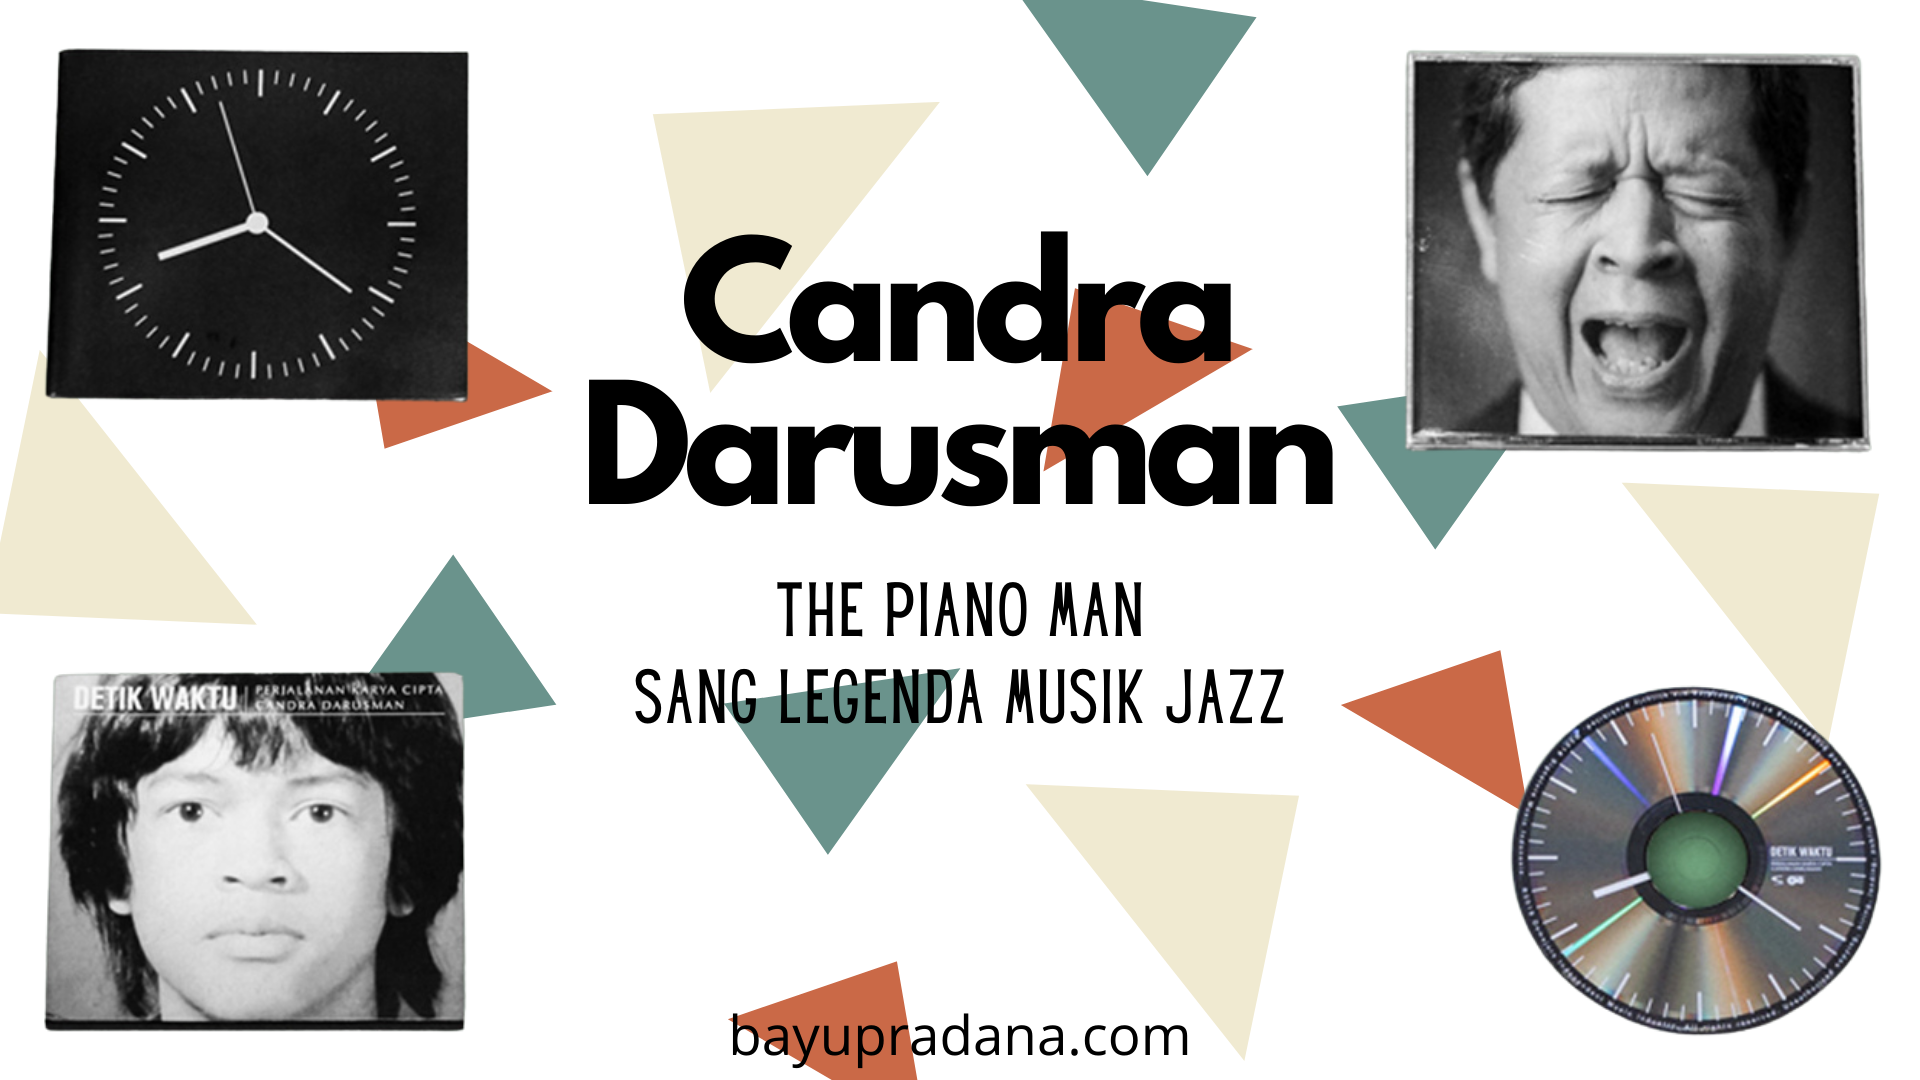 Candra Darusman, The Piano Man sang Legenda Musik Jazz